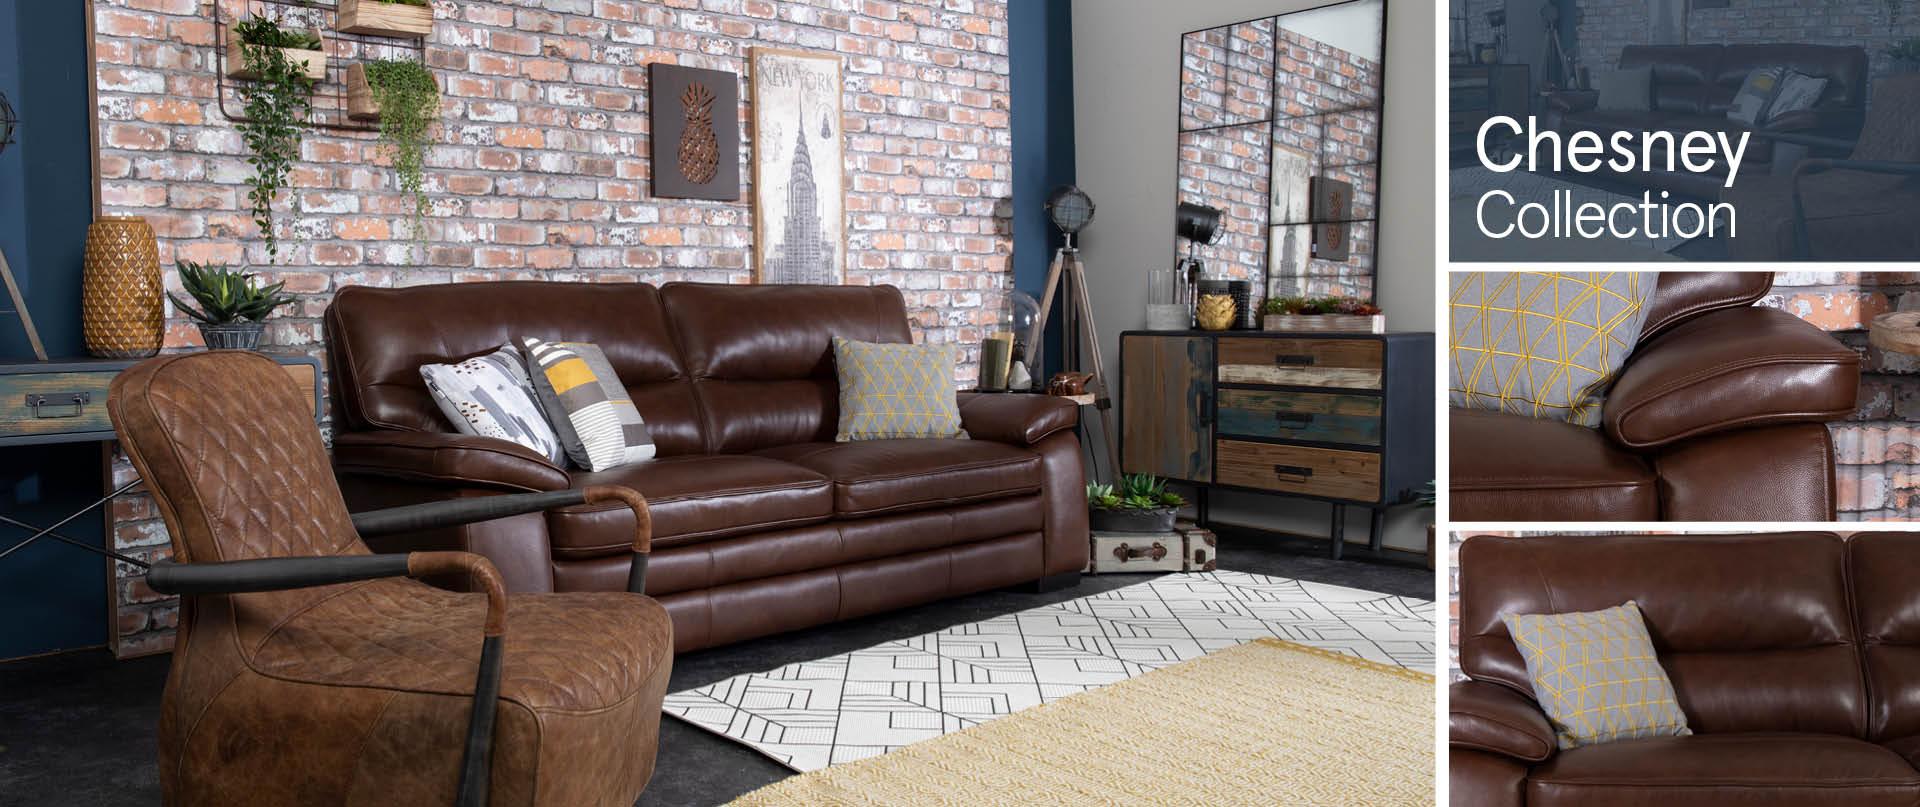 Chesney Leather Sofas Ranges